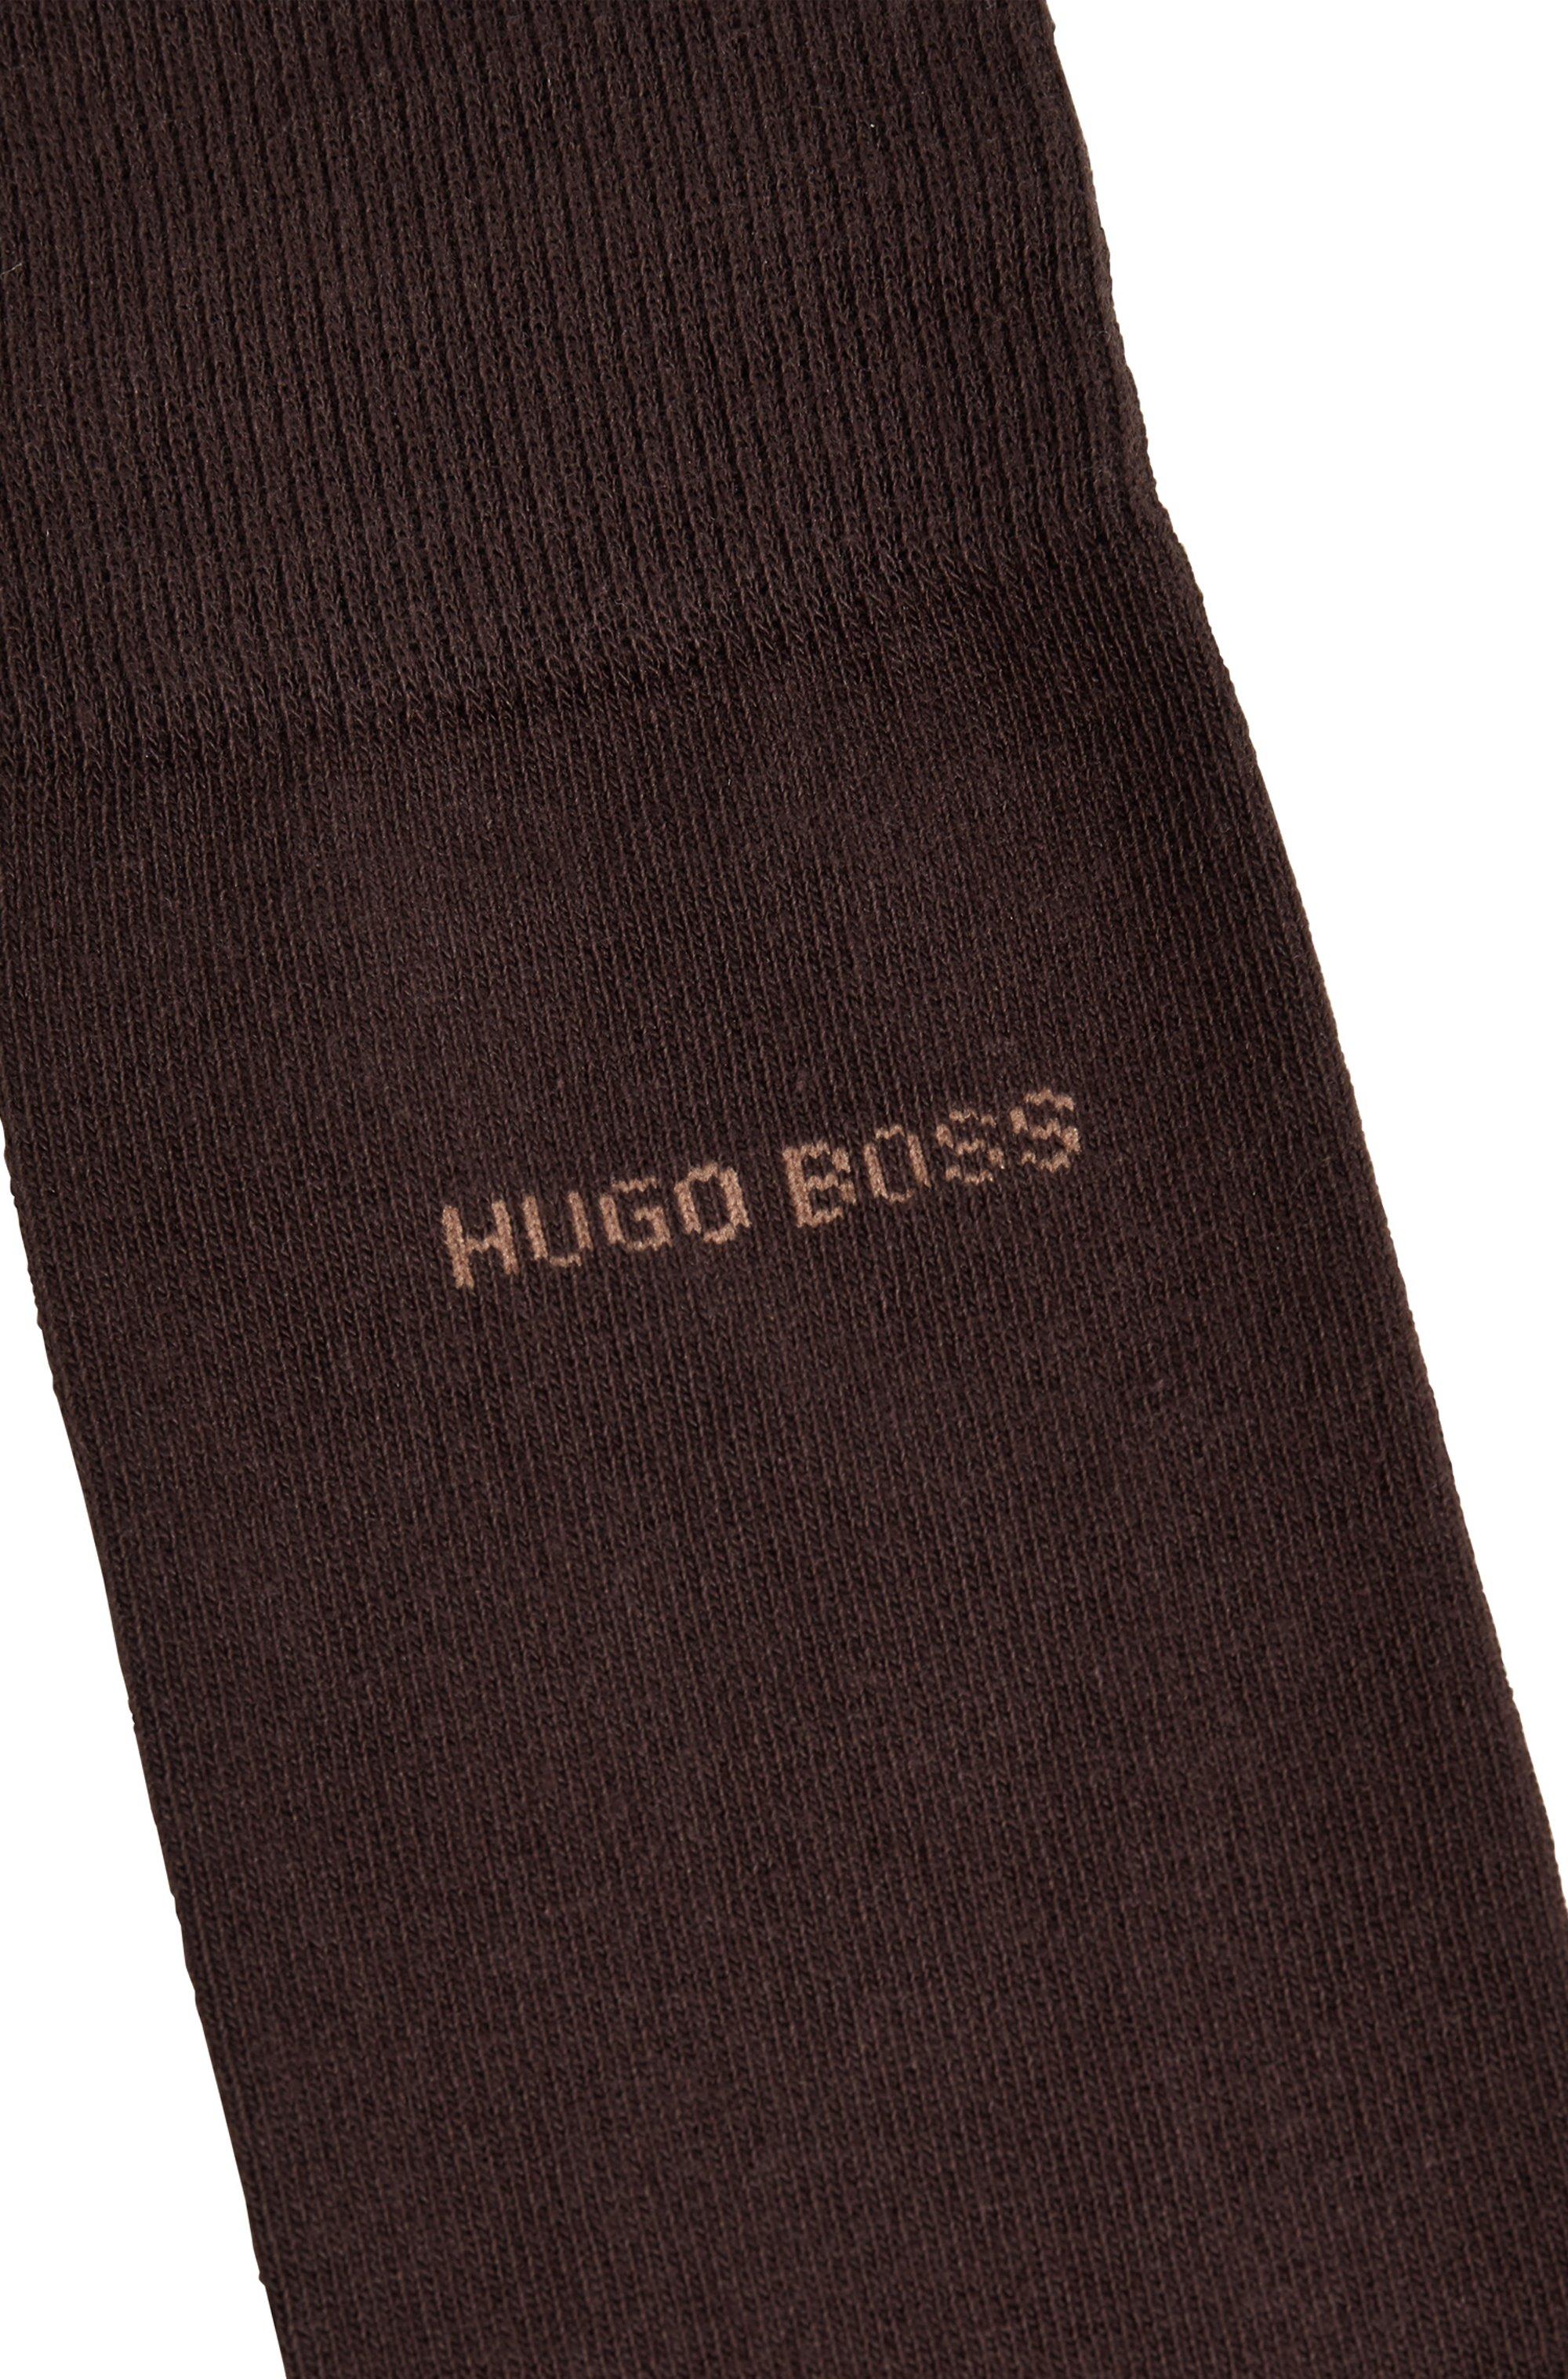 Two-pack of regular-length socks in a cotton blend